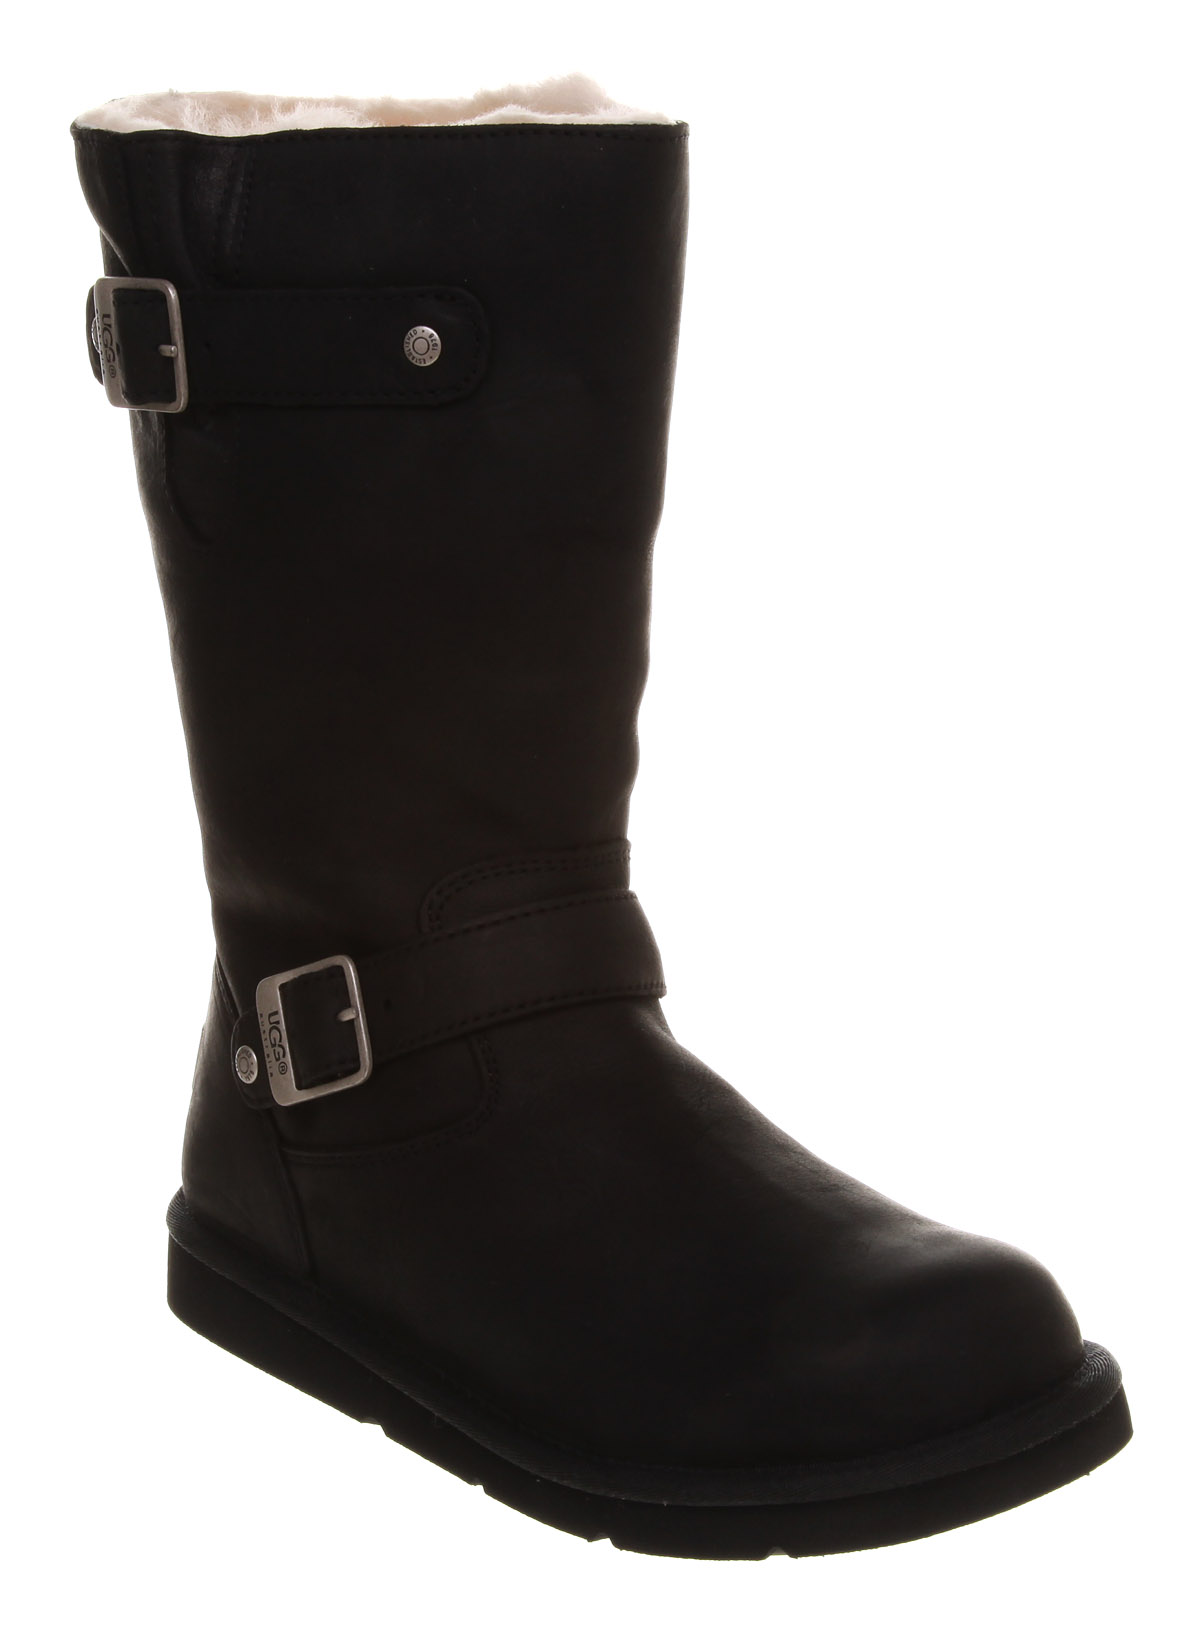 Ugg Kensington Biker Boot Black Leather In Black Lyst